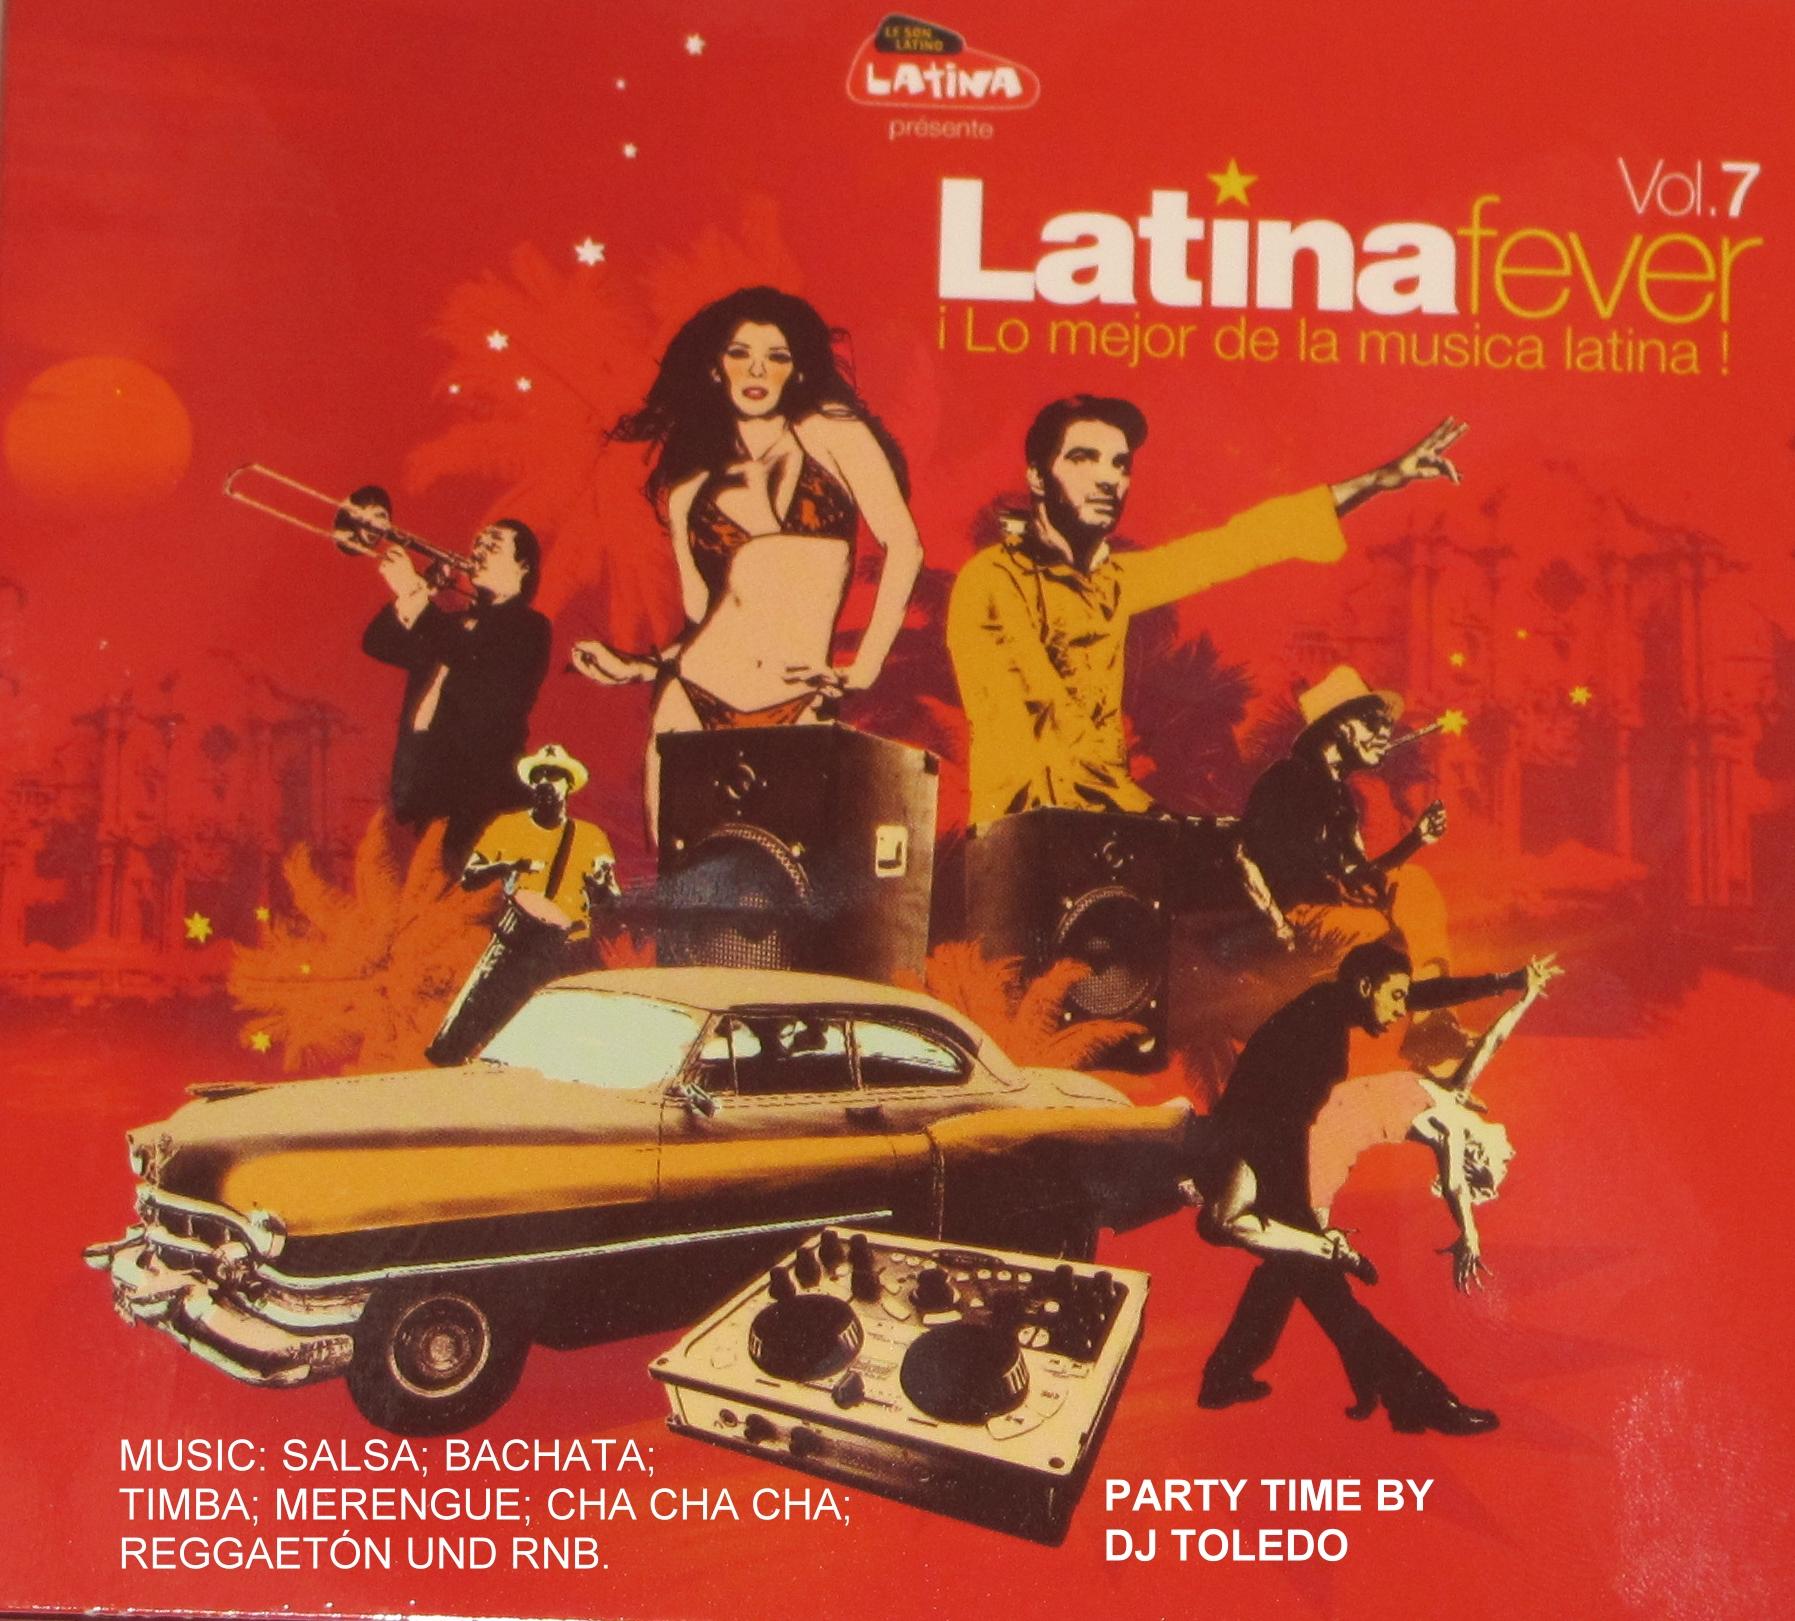 la mejor musica latina: